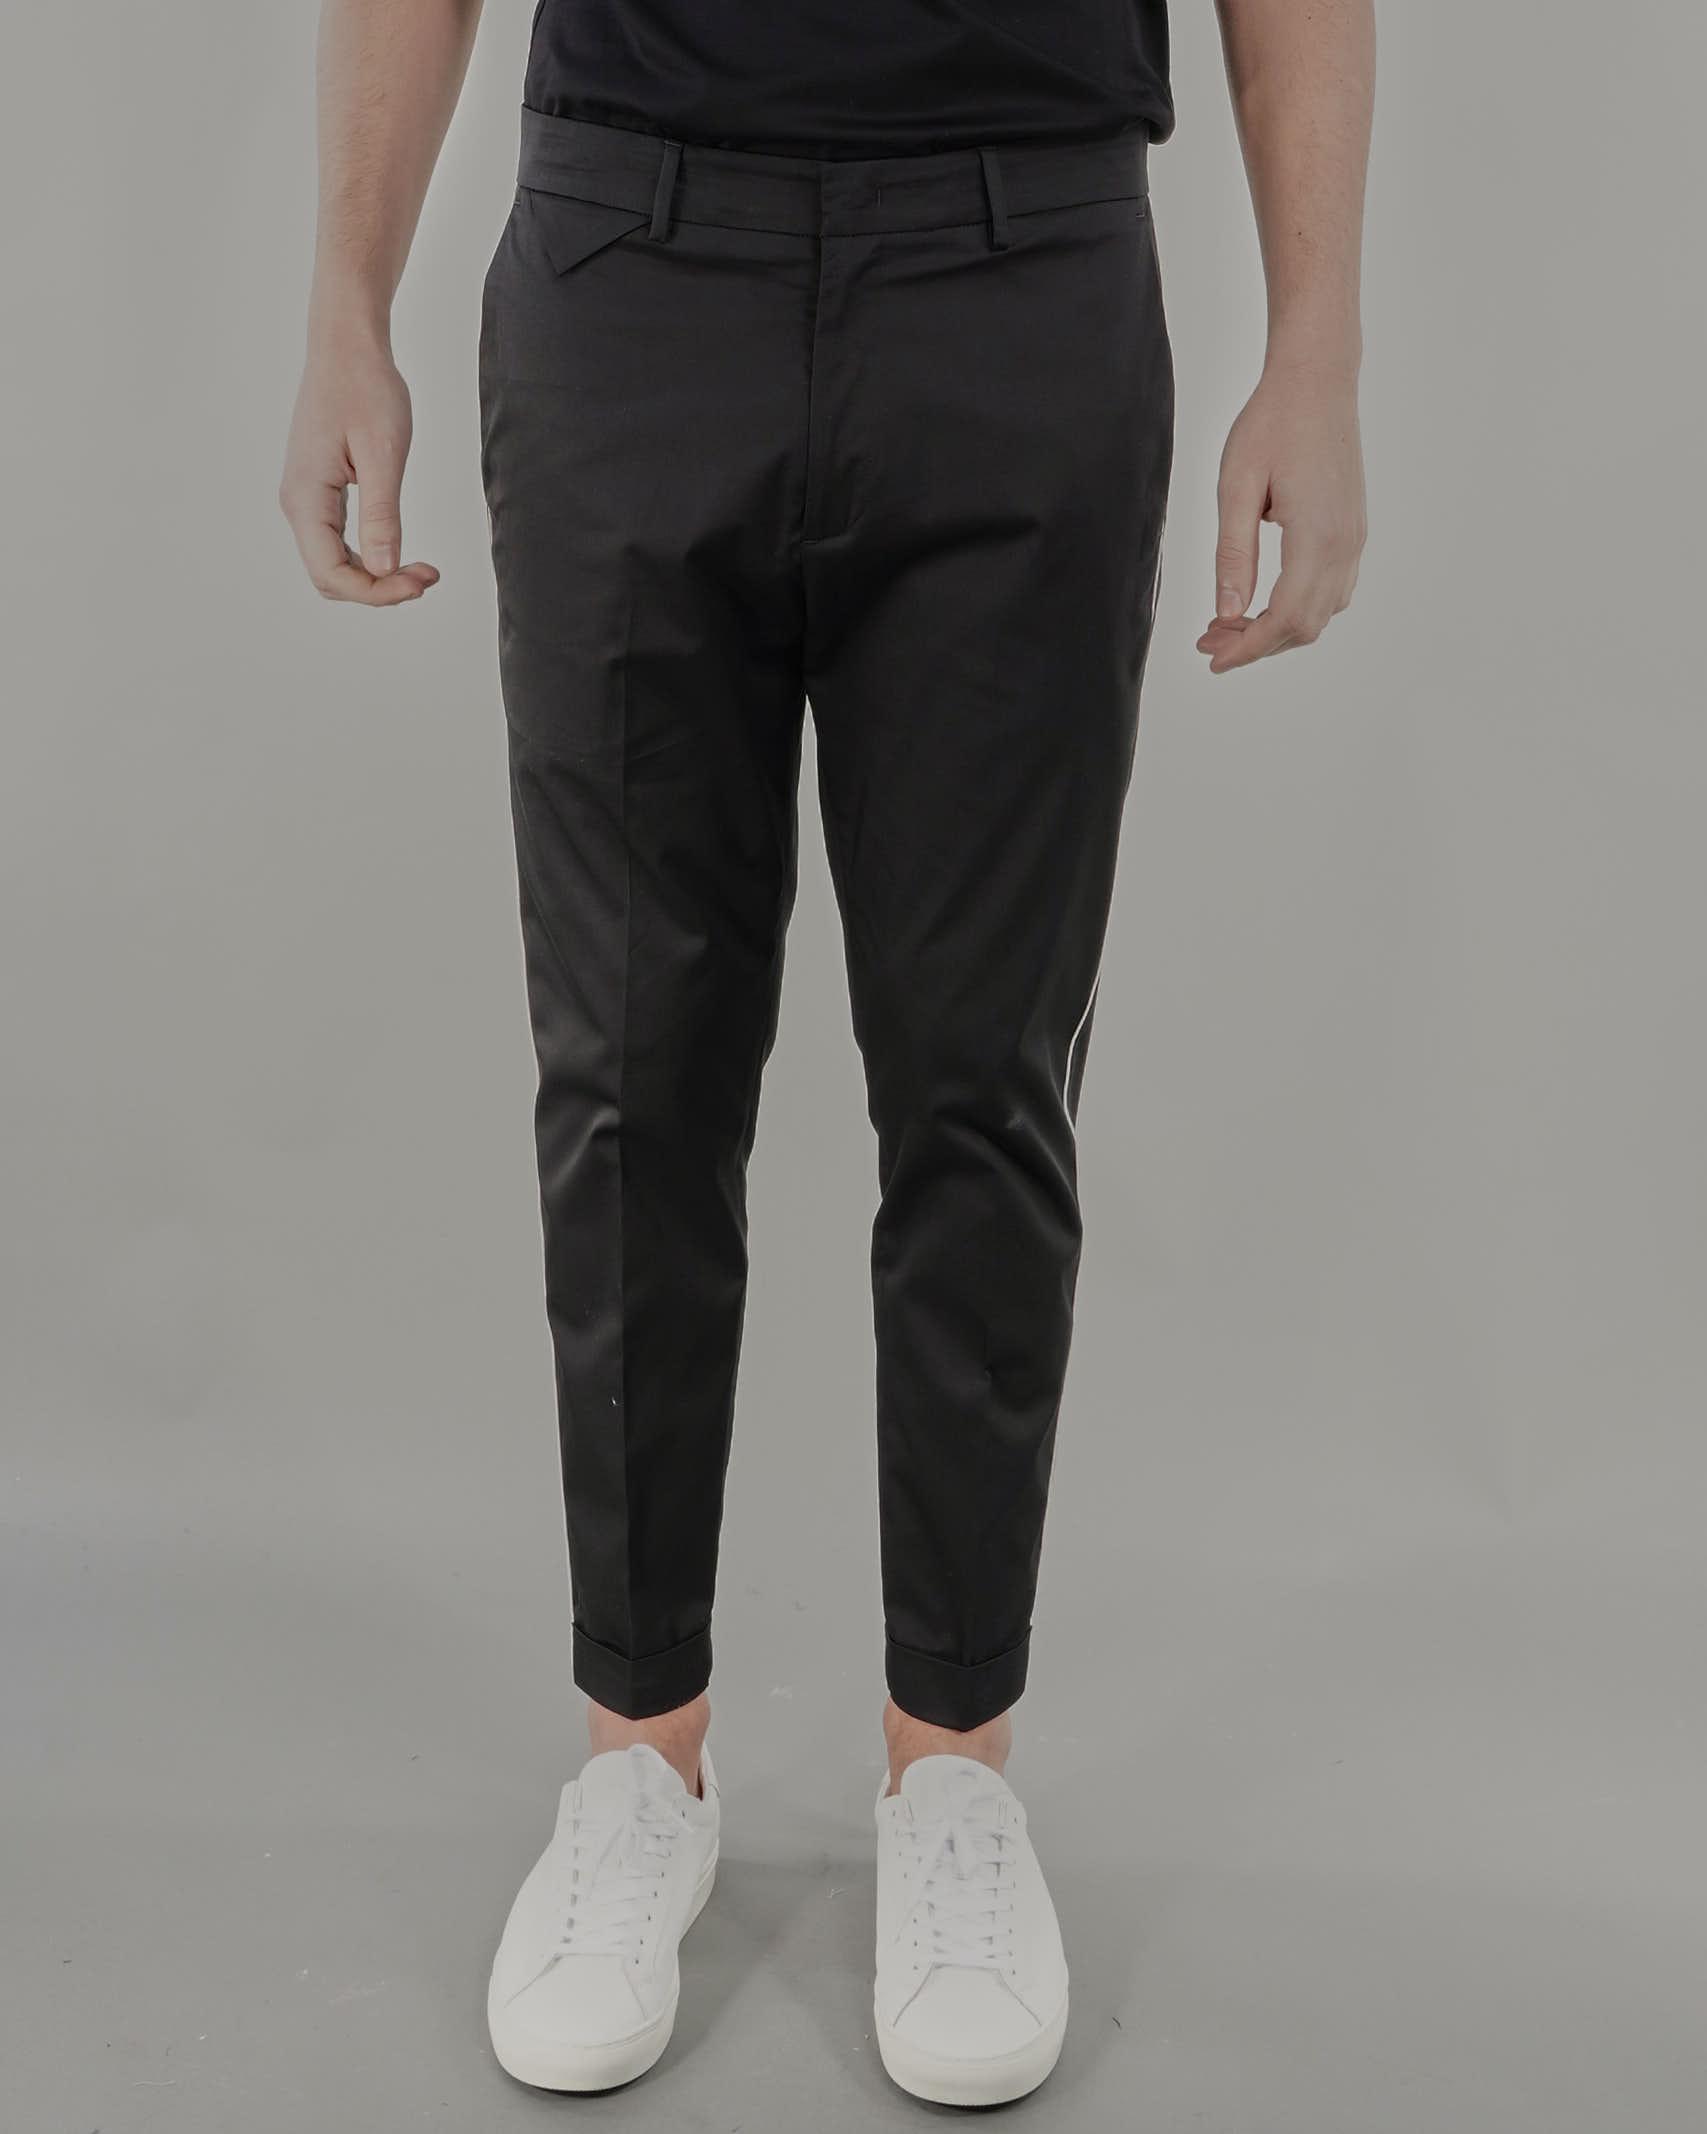 Pantalone in cotone con banda a contasto Low Brand LOW BRAND | Pantalone | L1PSS215686D001